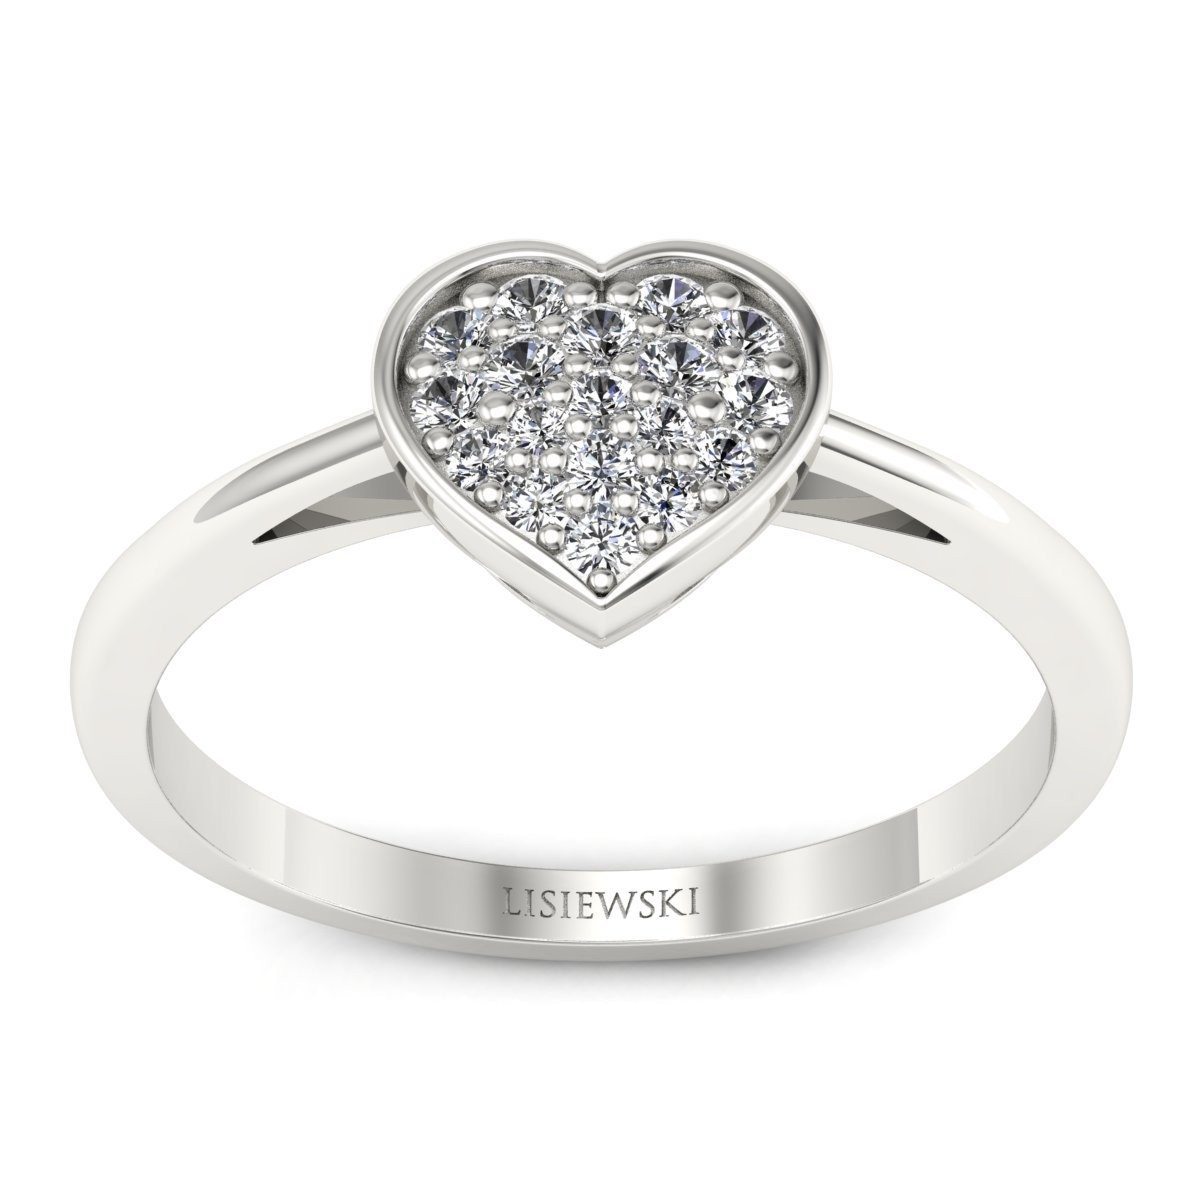 Heart - Pierścionek z diamentami